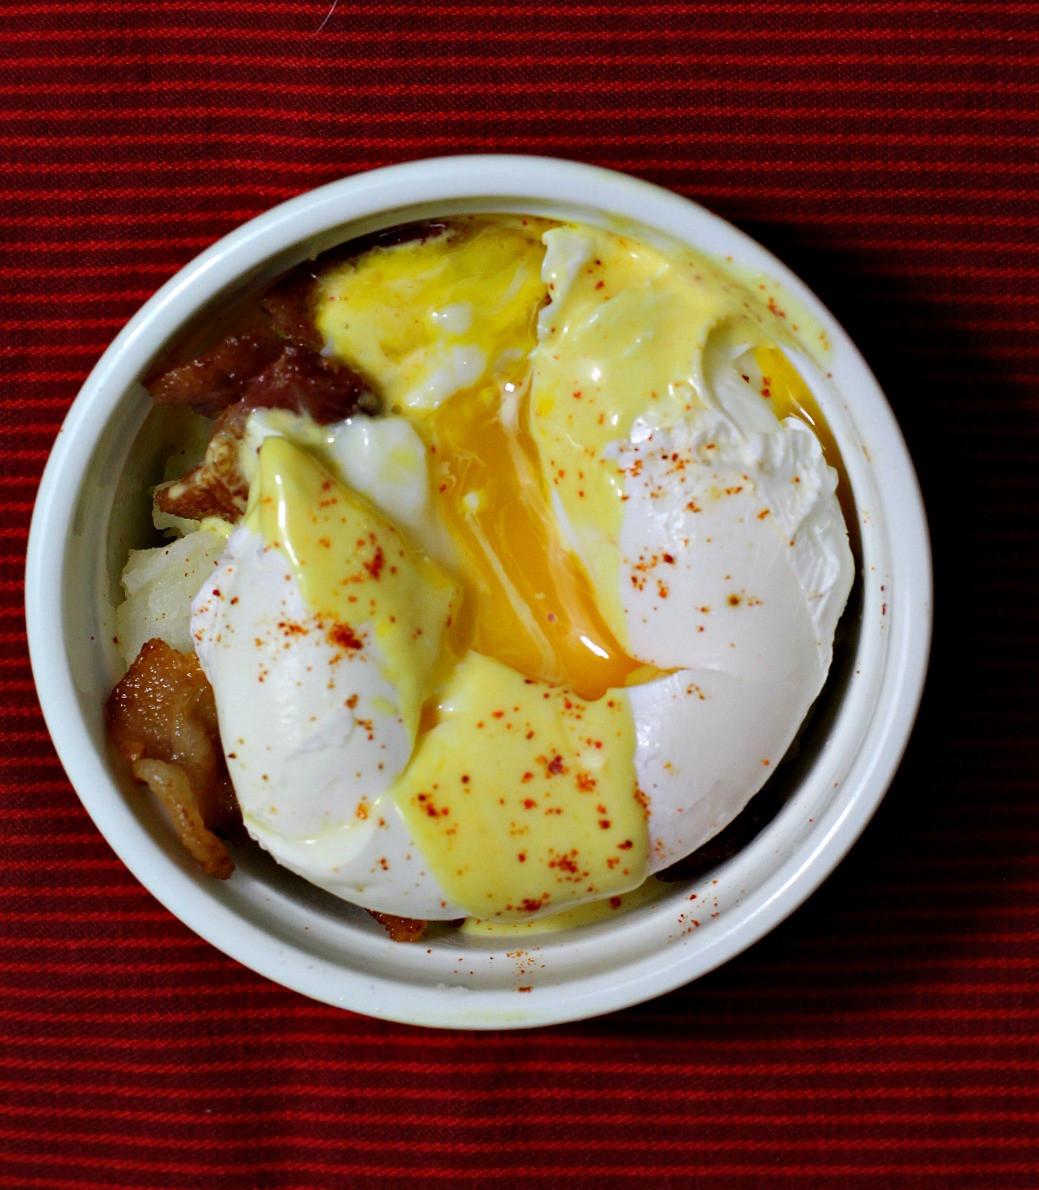 Breakfast Mashed Potatoes  Individual Mashed Potato Breakfast Ramekins